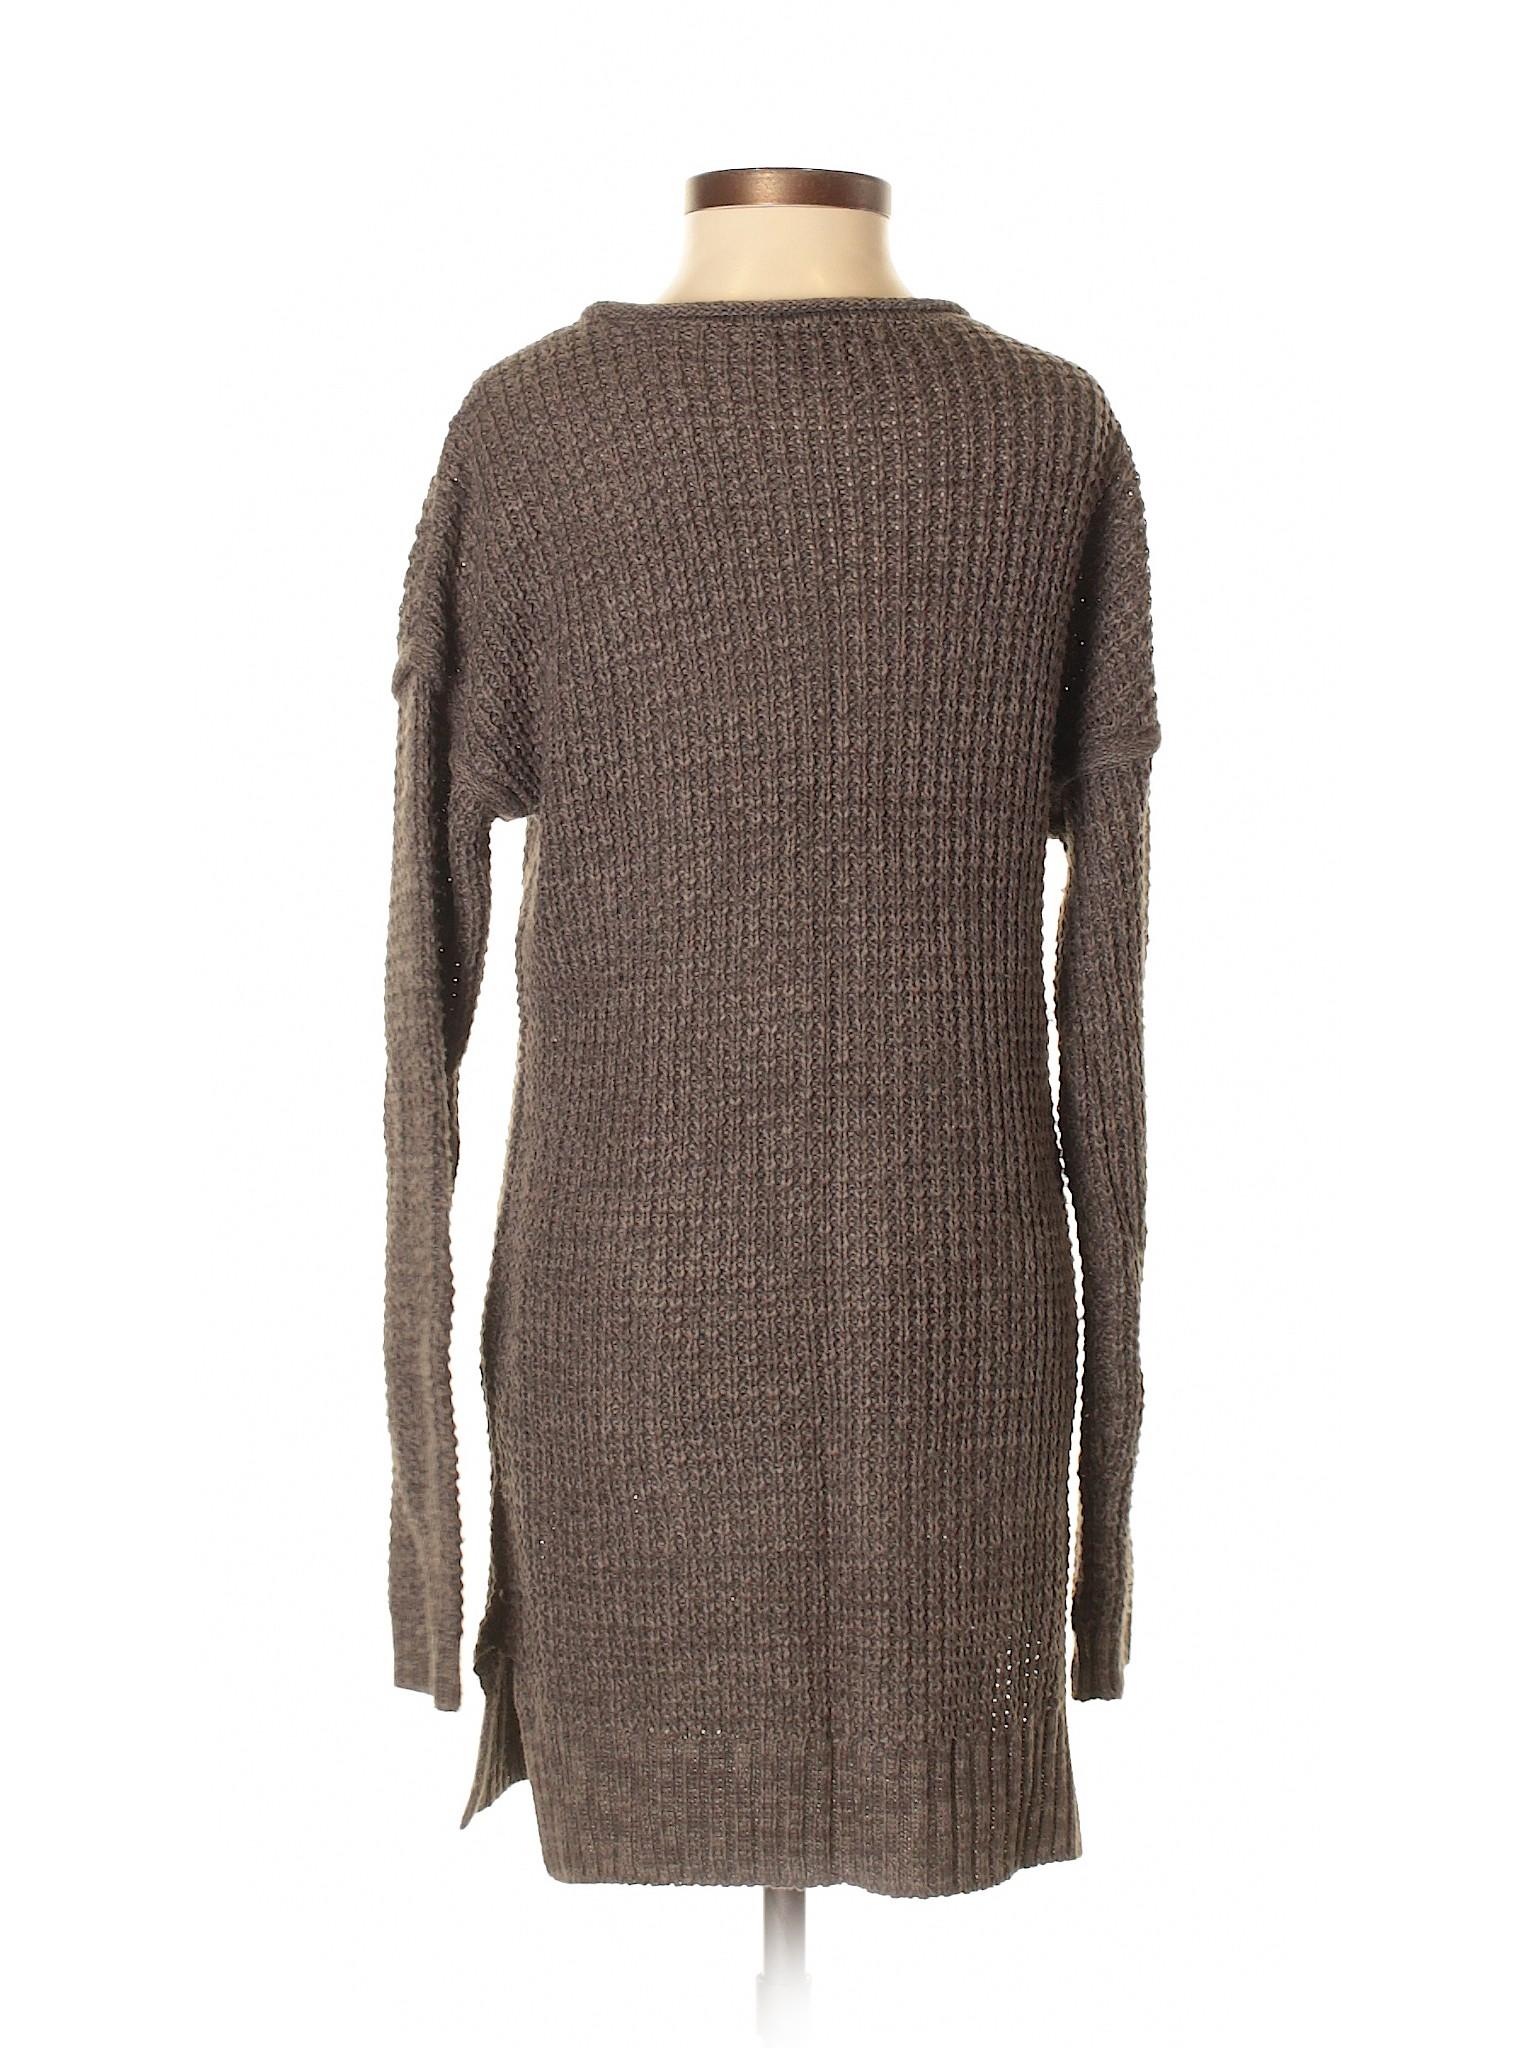 winter Fuentes Sweater Boutique Daisy Pullover qCESHd